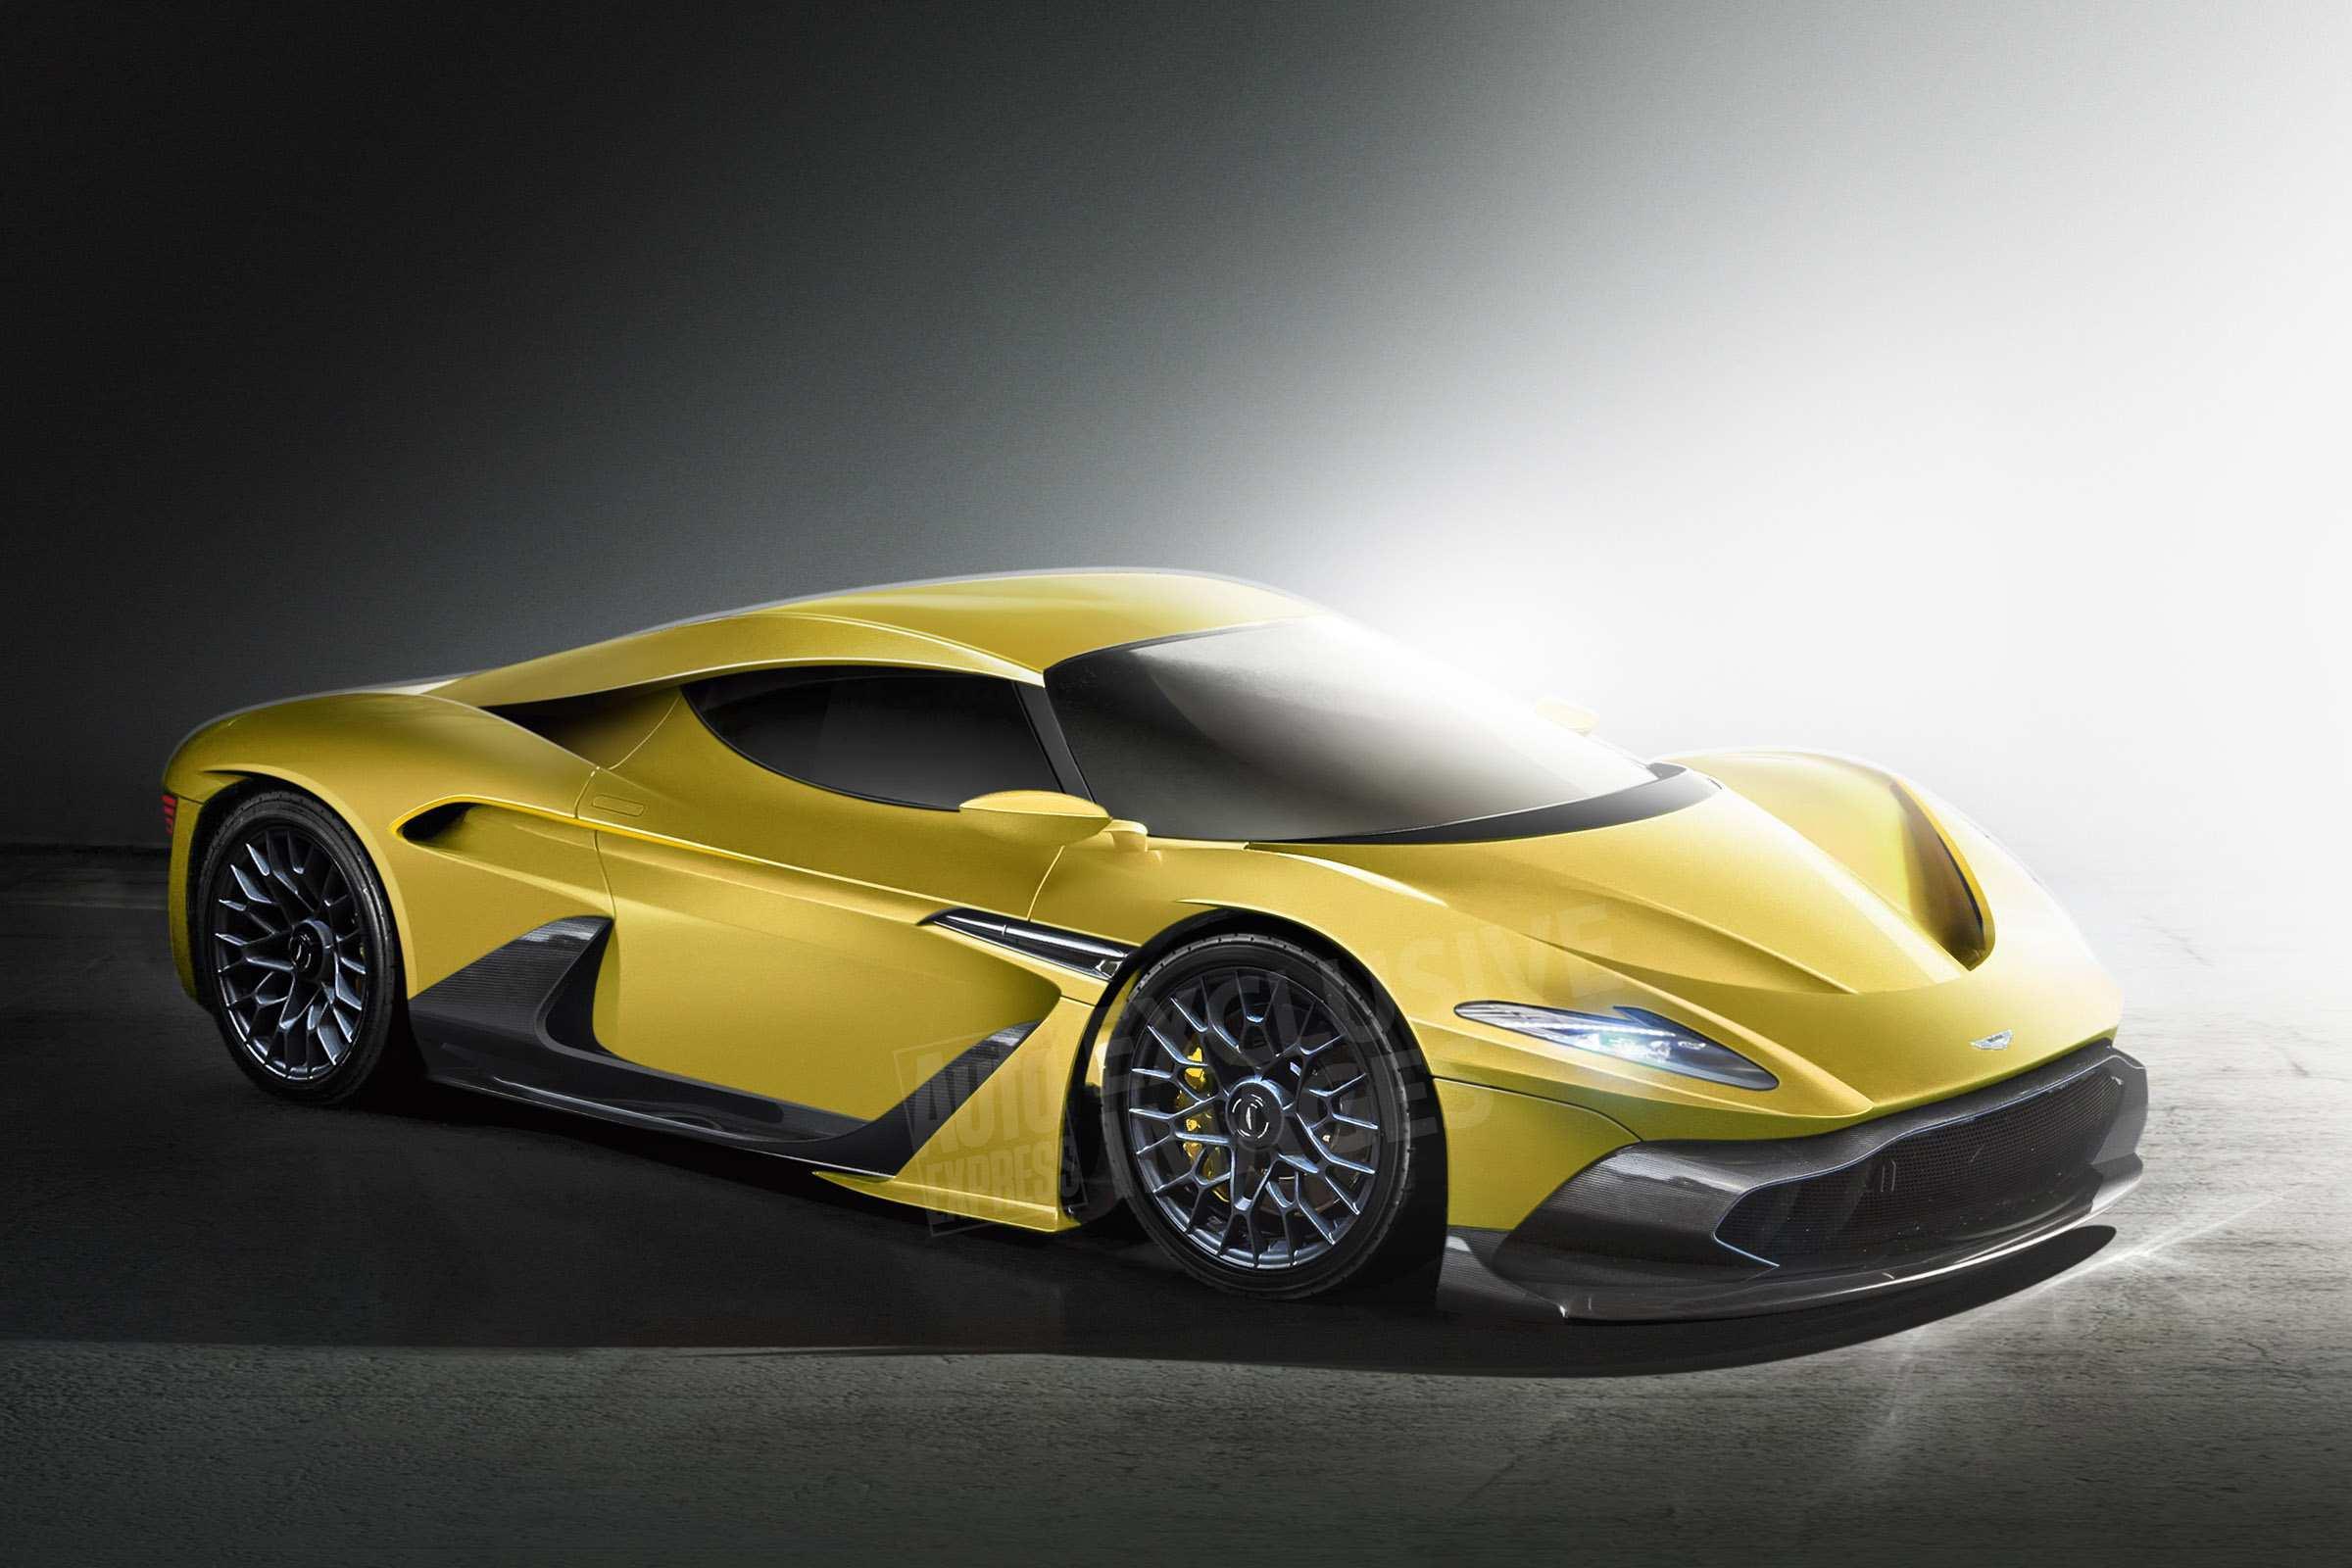 85 Gallery of 2020 Aston Martin Vanquish Interior for 2020 Aston Martin Vanquish